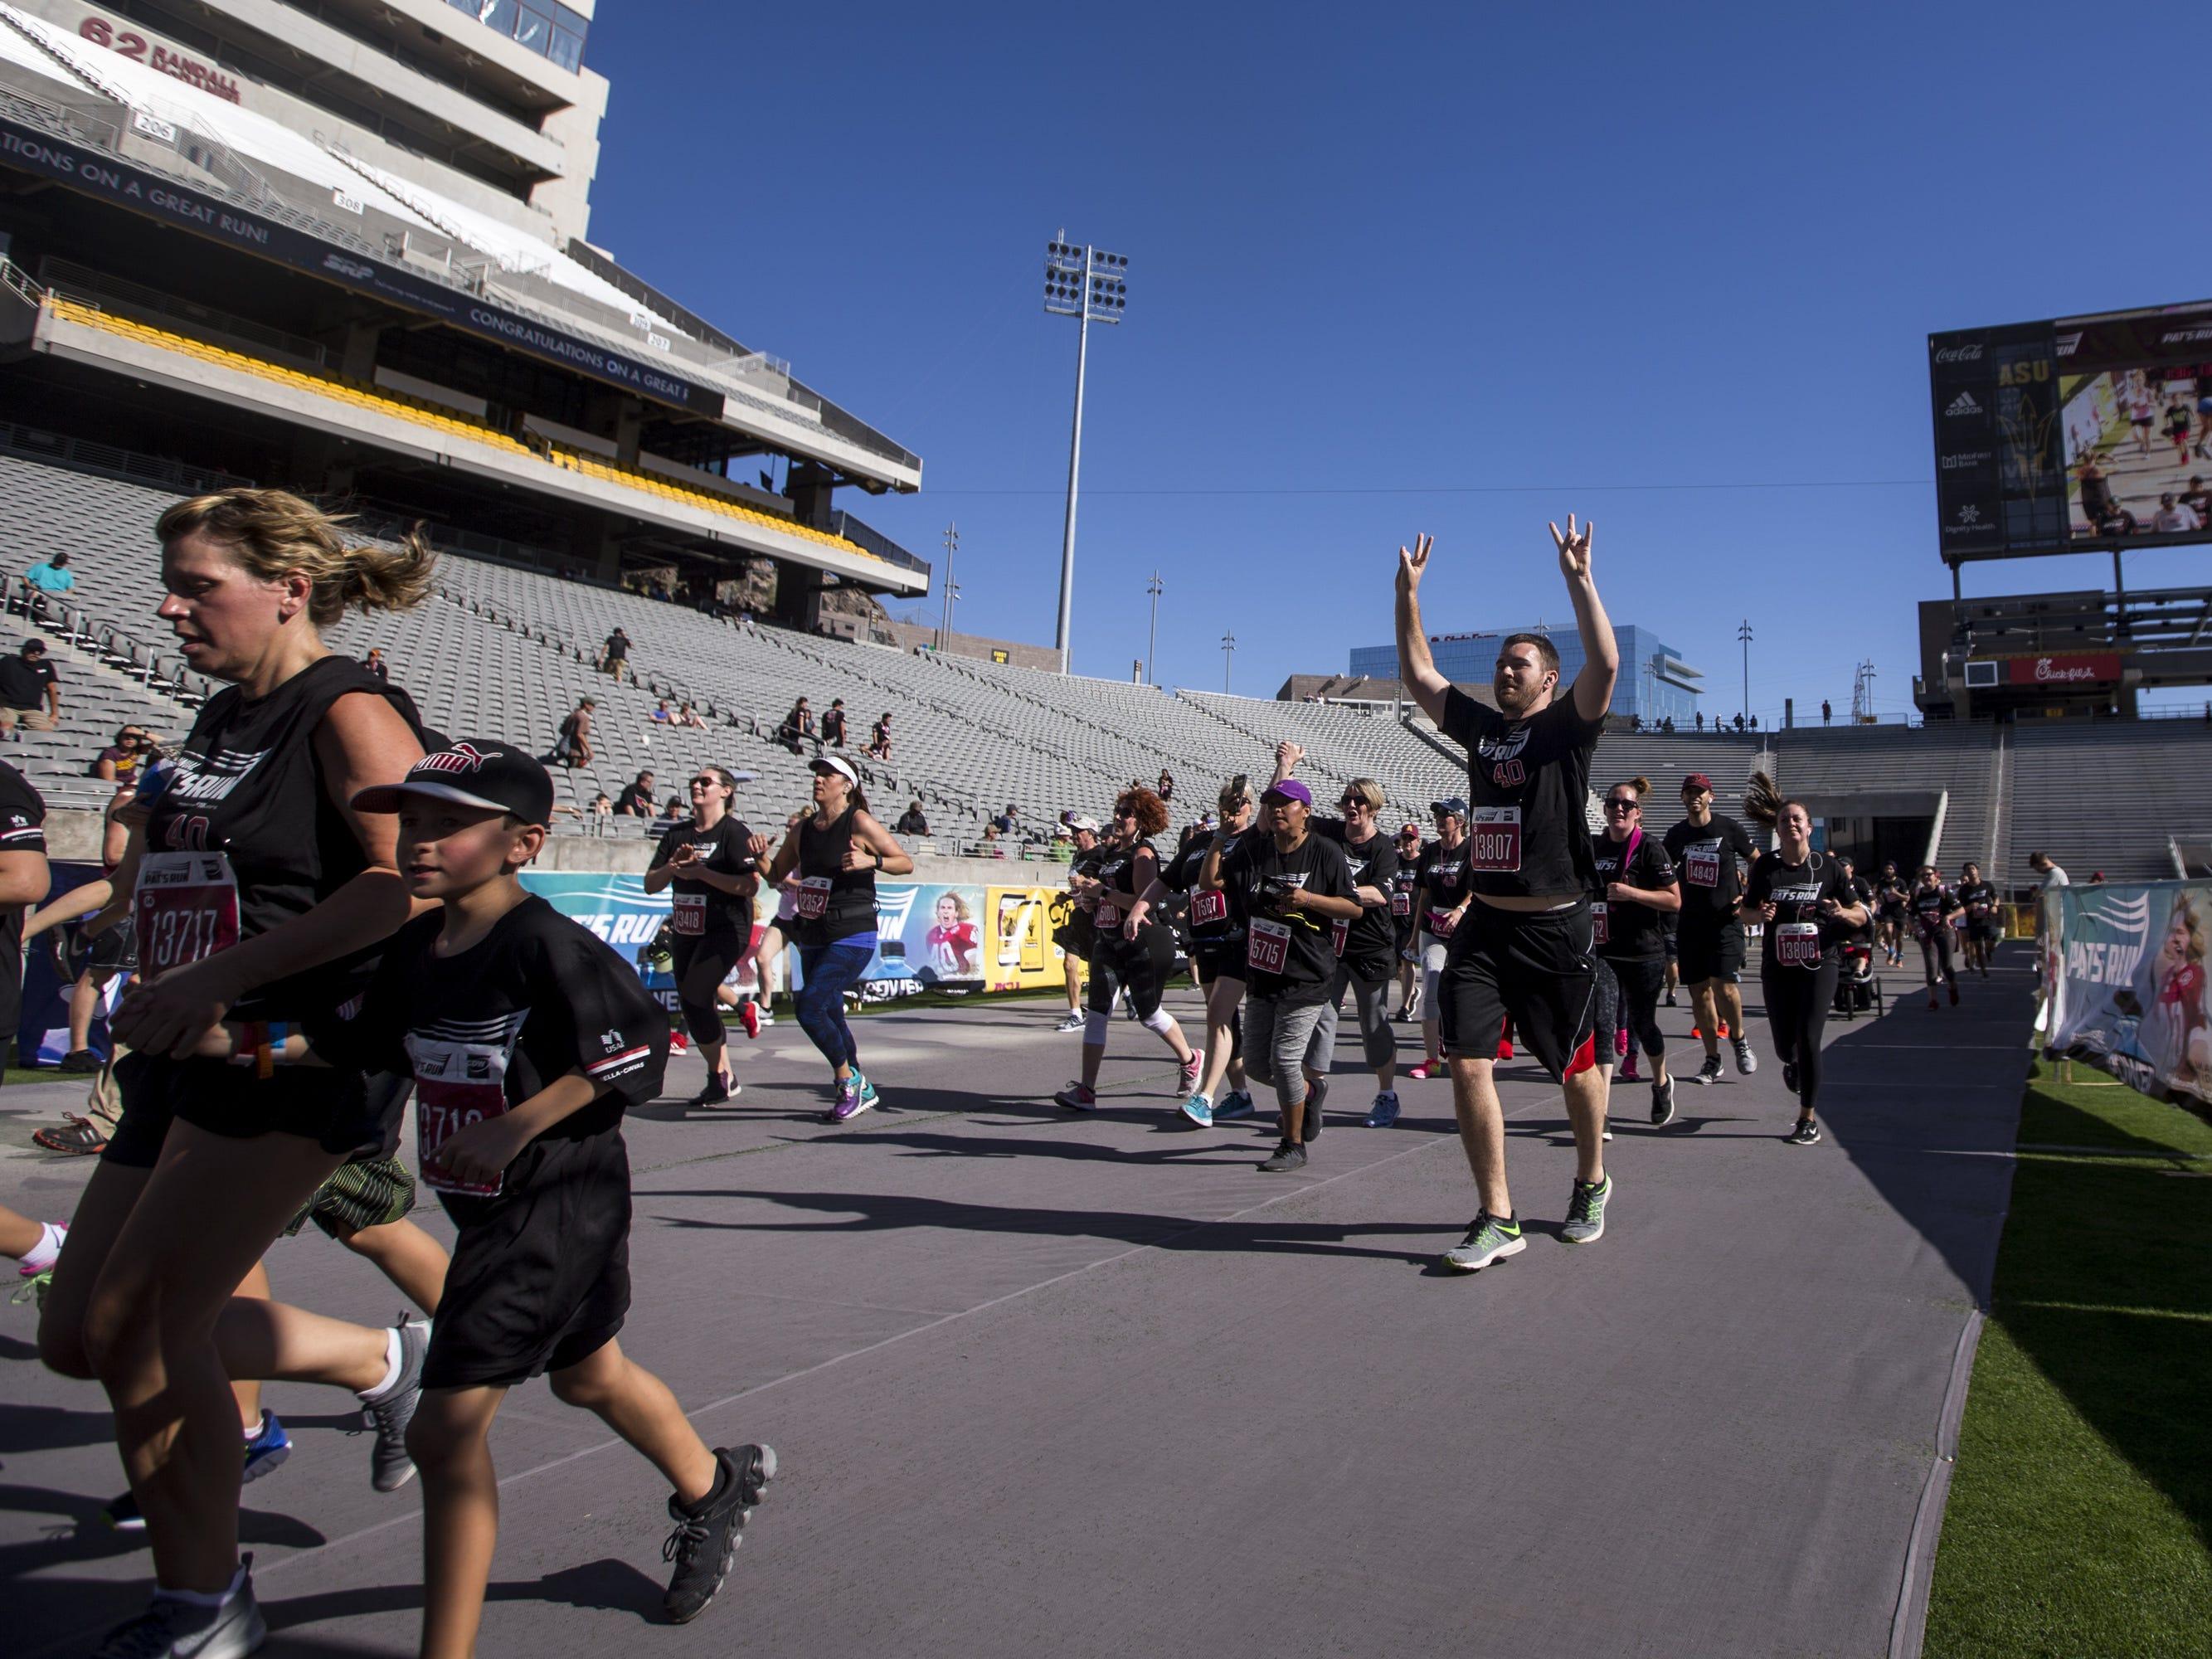 Participants run toward the finish line at Sun Devil Stadium during the 15th Annual Pat's Run on Saturday, April 27, 2019, in Tempe, Ariz.